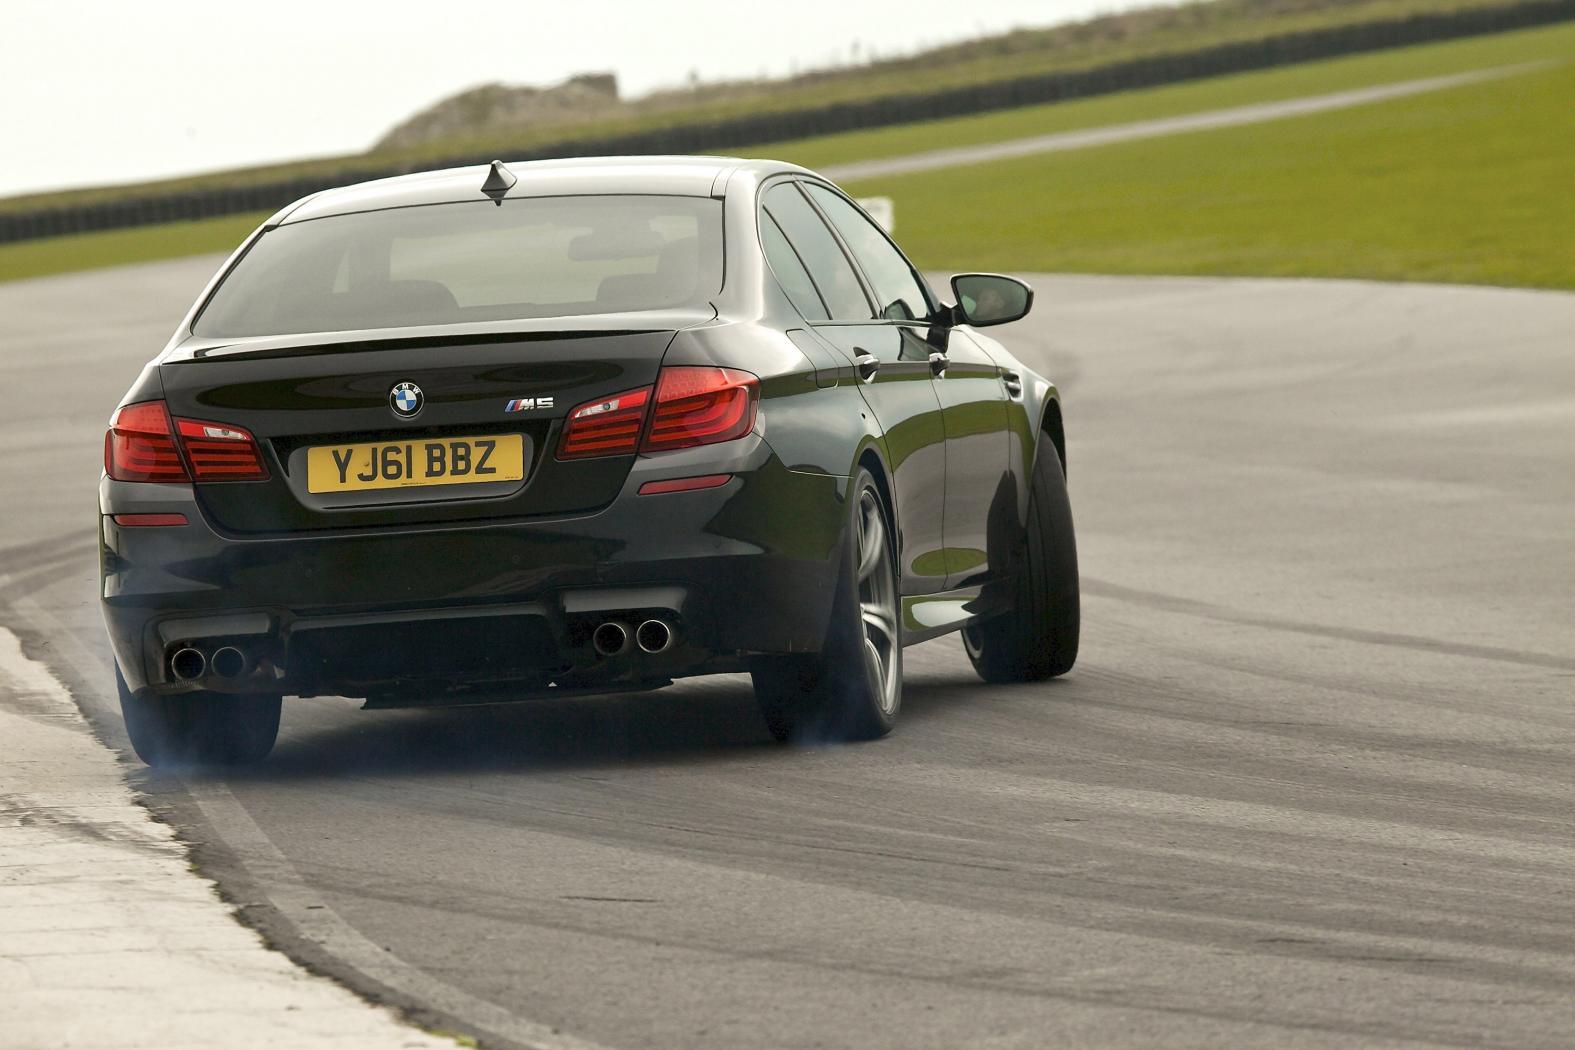 BMW-M5-F10-5.jpeg